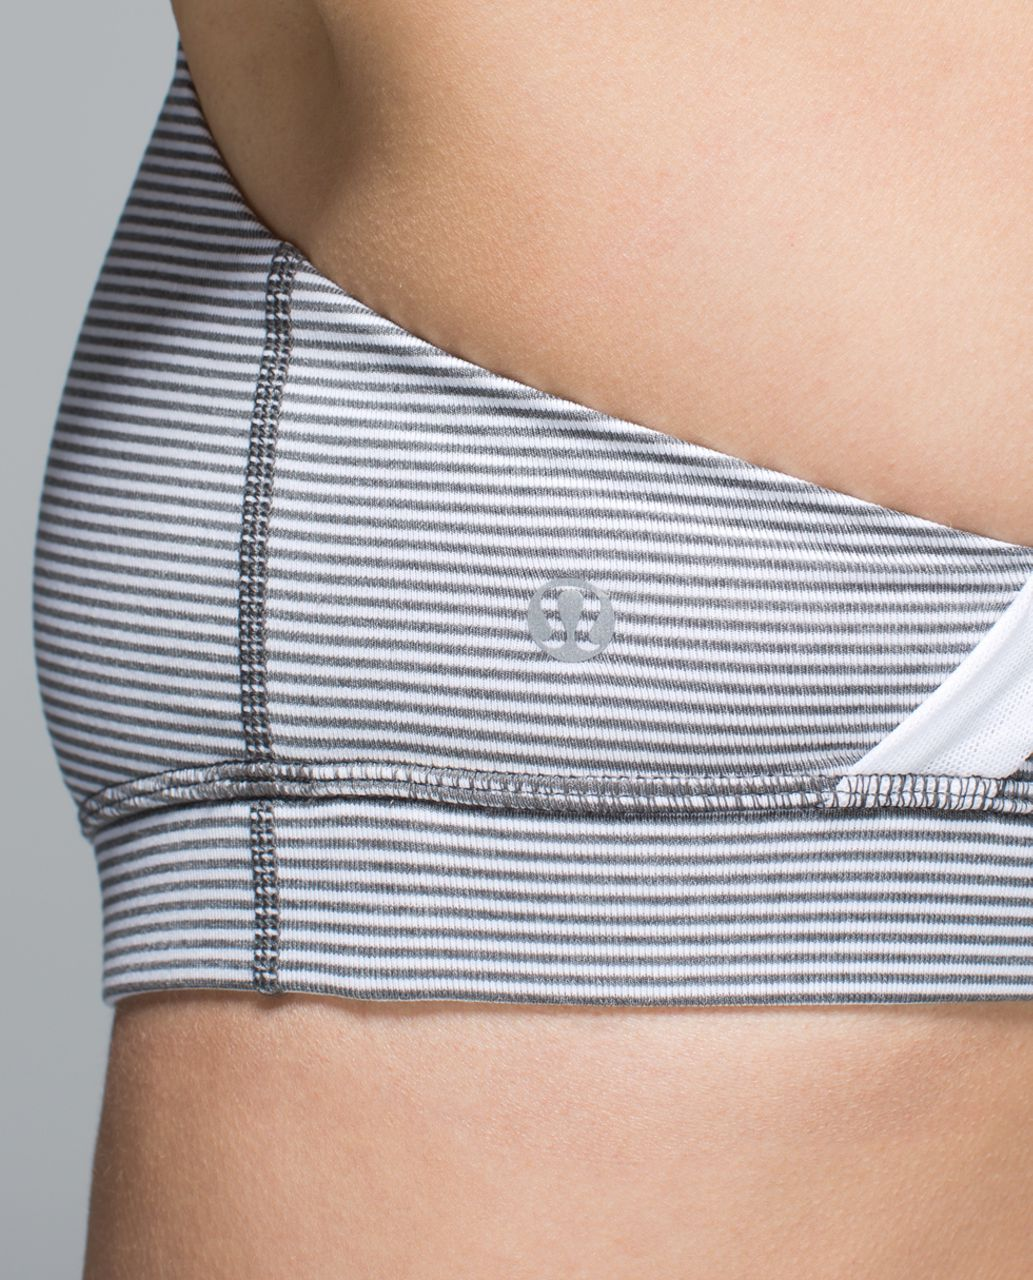 Lululemon 50 Rep Bra - Tonka Stripe Heathered Slate White